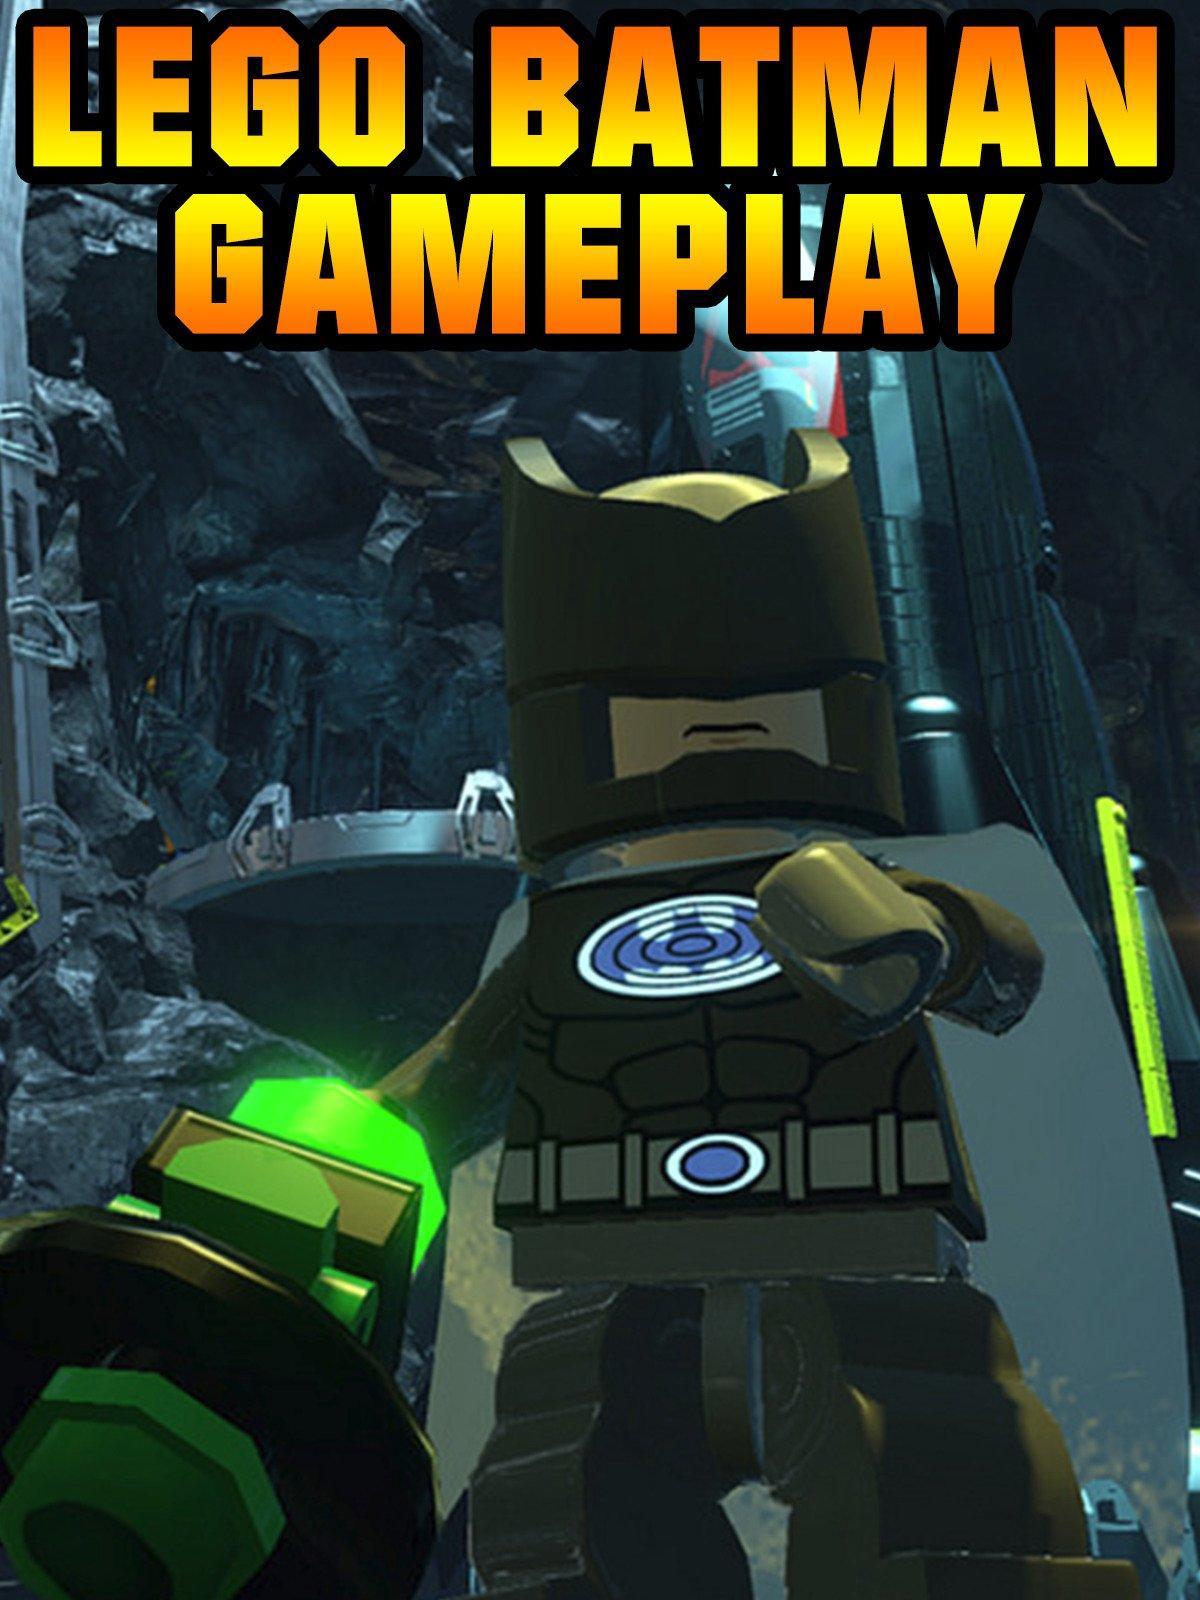 Clip: Lego Batman Gameplay